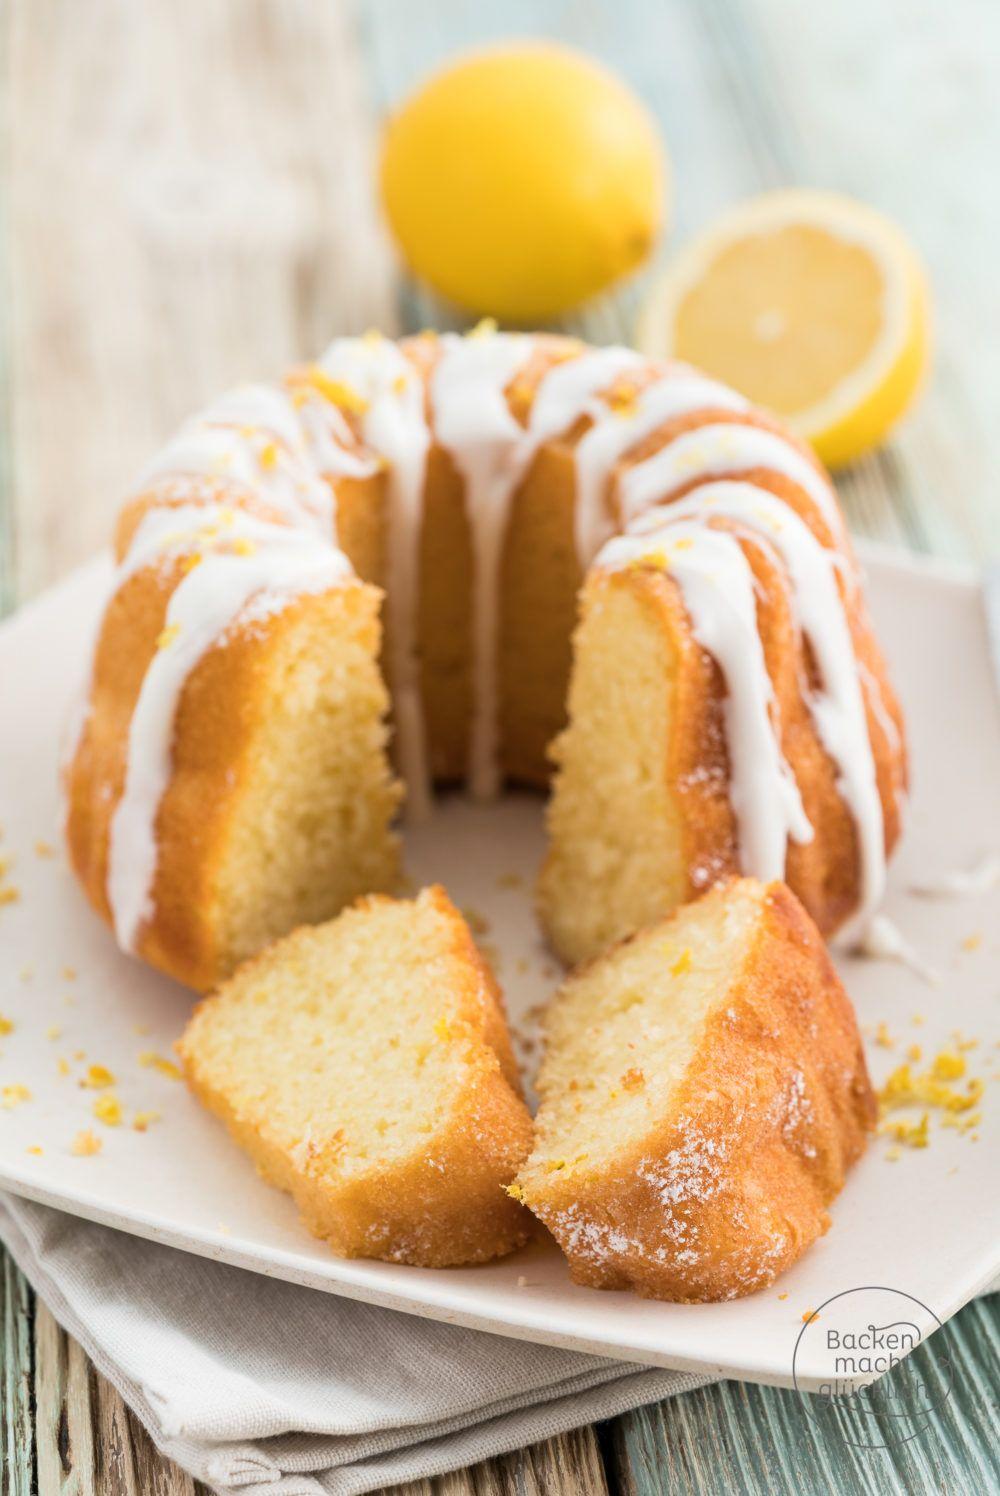 Zitronen Joghurt Gugelhupf Rezept Gugelhupf Backen Rezepte Zitronen Kuchen